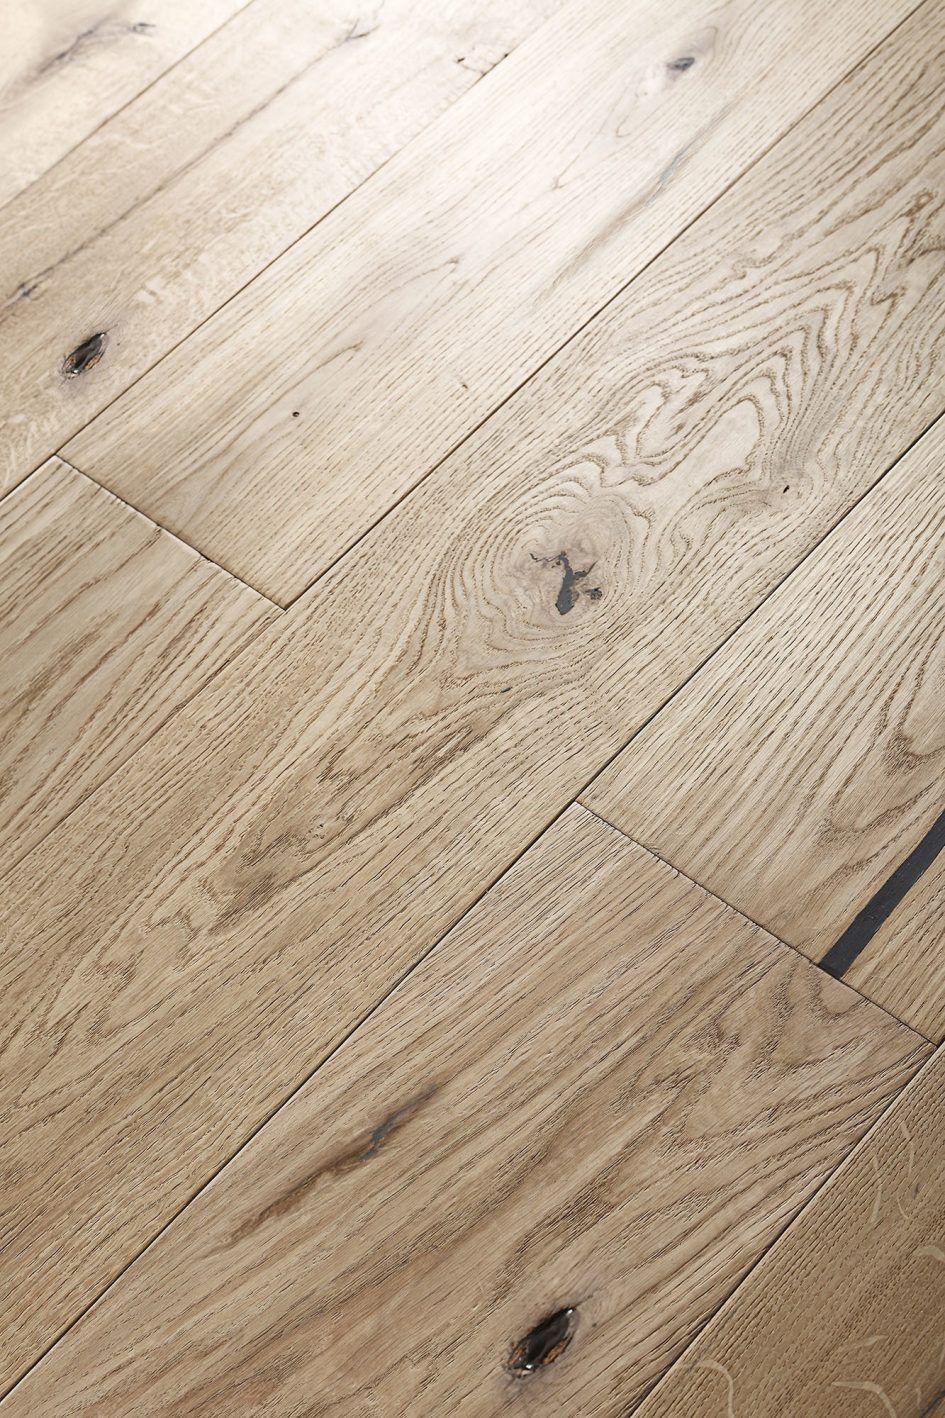 Hardwood Floor Contemporary Decoration White Oak Engineered Flooring Stunning Unfinished Hardwood 2 1 4 Prices White Oak Hardwood Floori Decoracao E Casas